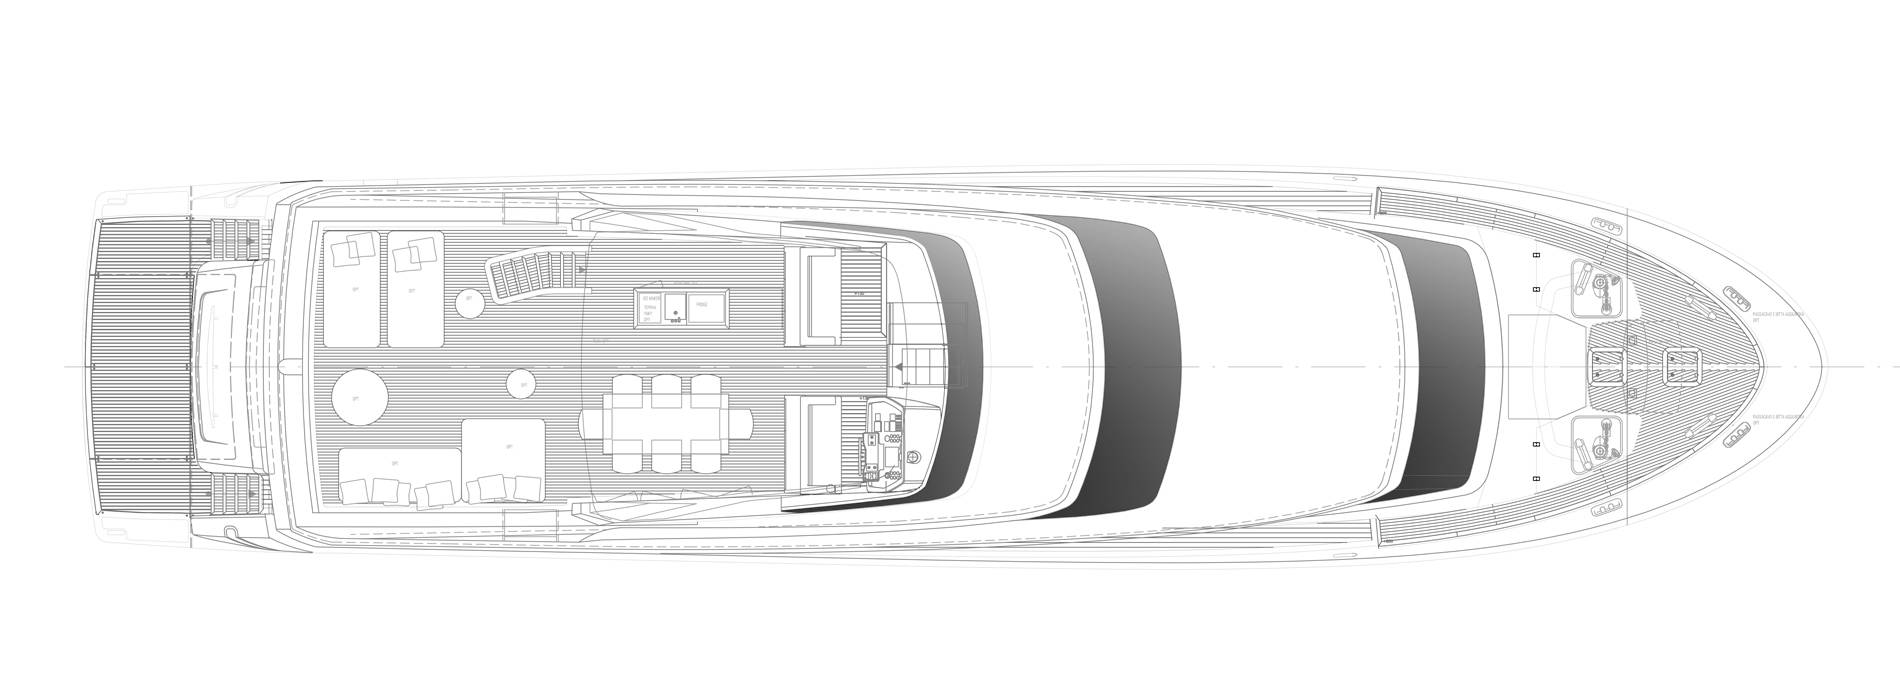 Sanlorenzo Yachts SL96-631 Флайбридж